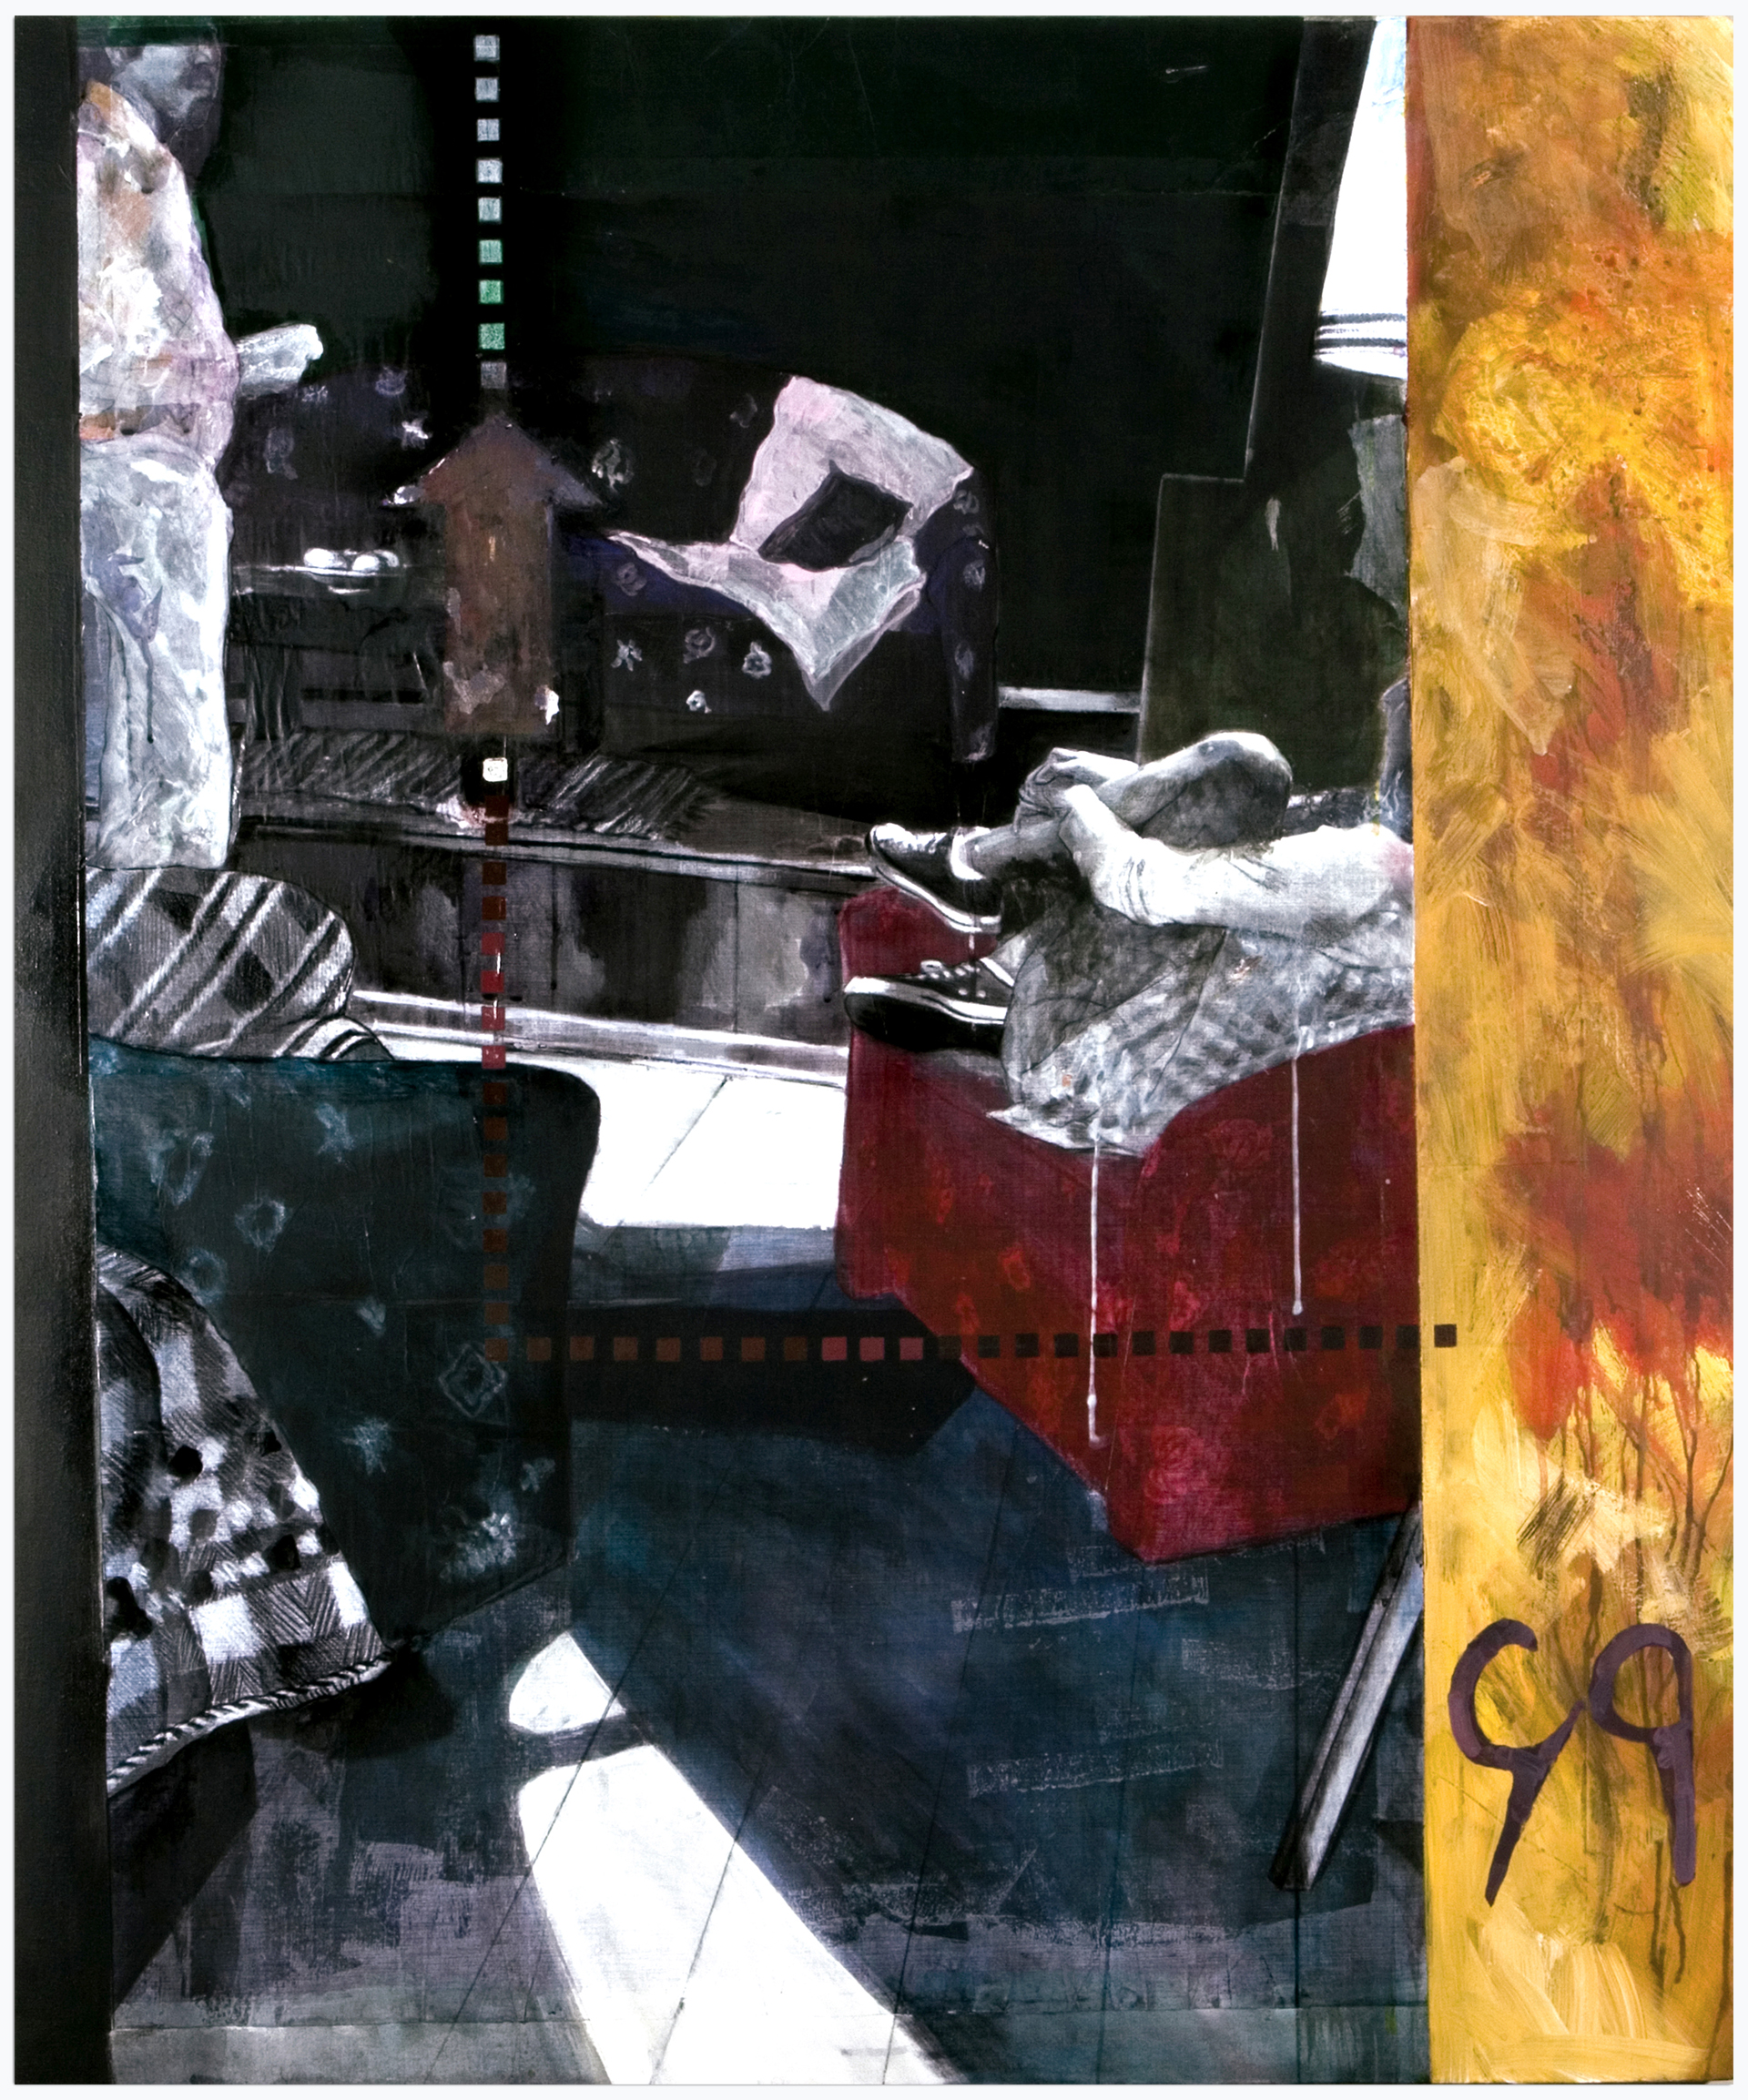 7_69-Medusa-Series-2010-a